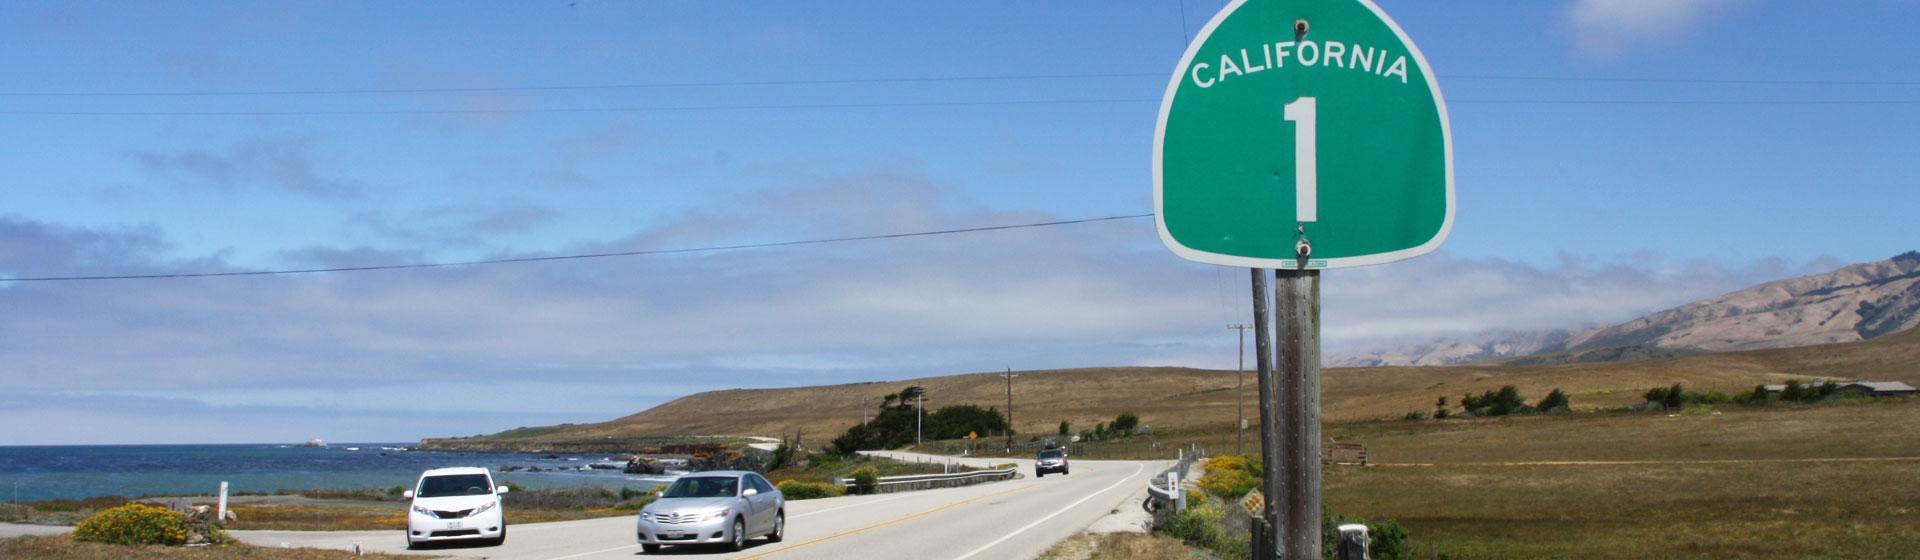 Highway 1 i Kalifornien.